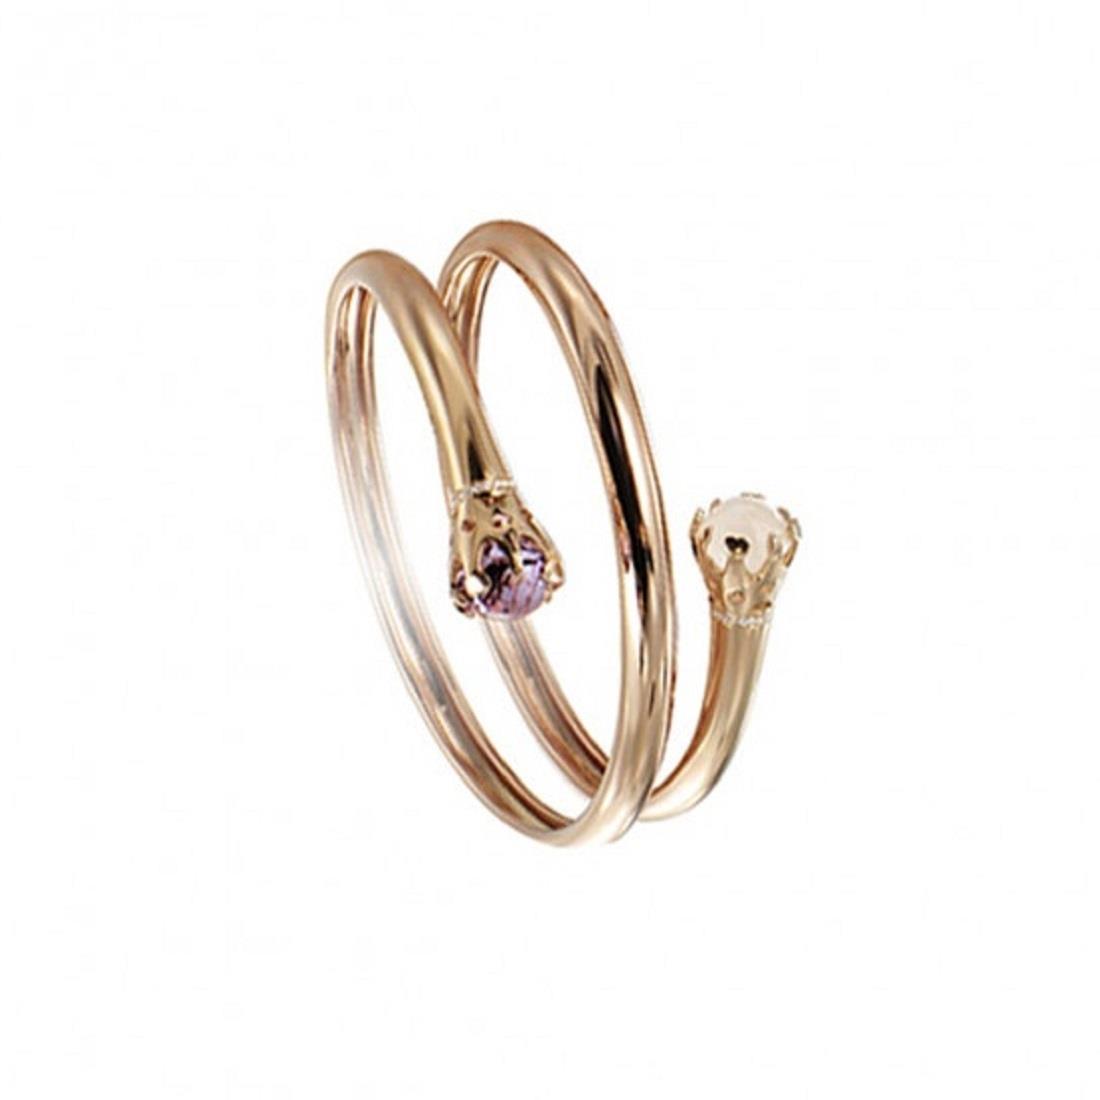 Bracciale design con diamanti - PASQUALE BRUNI